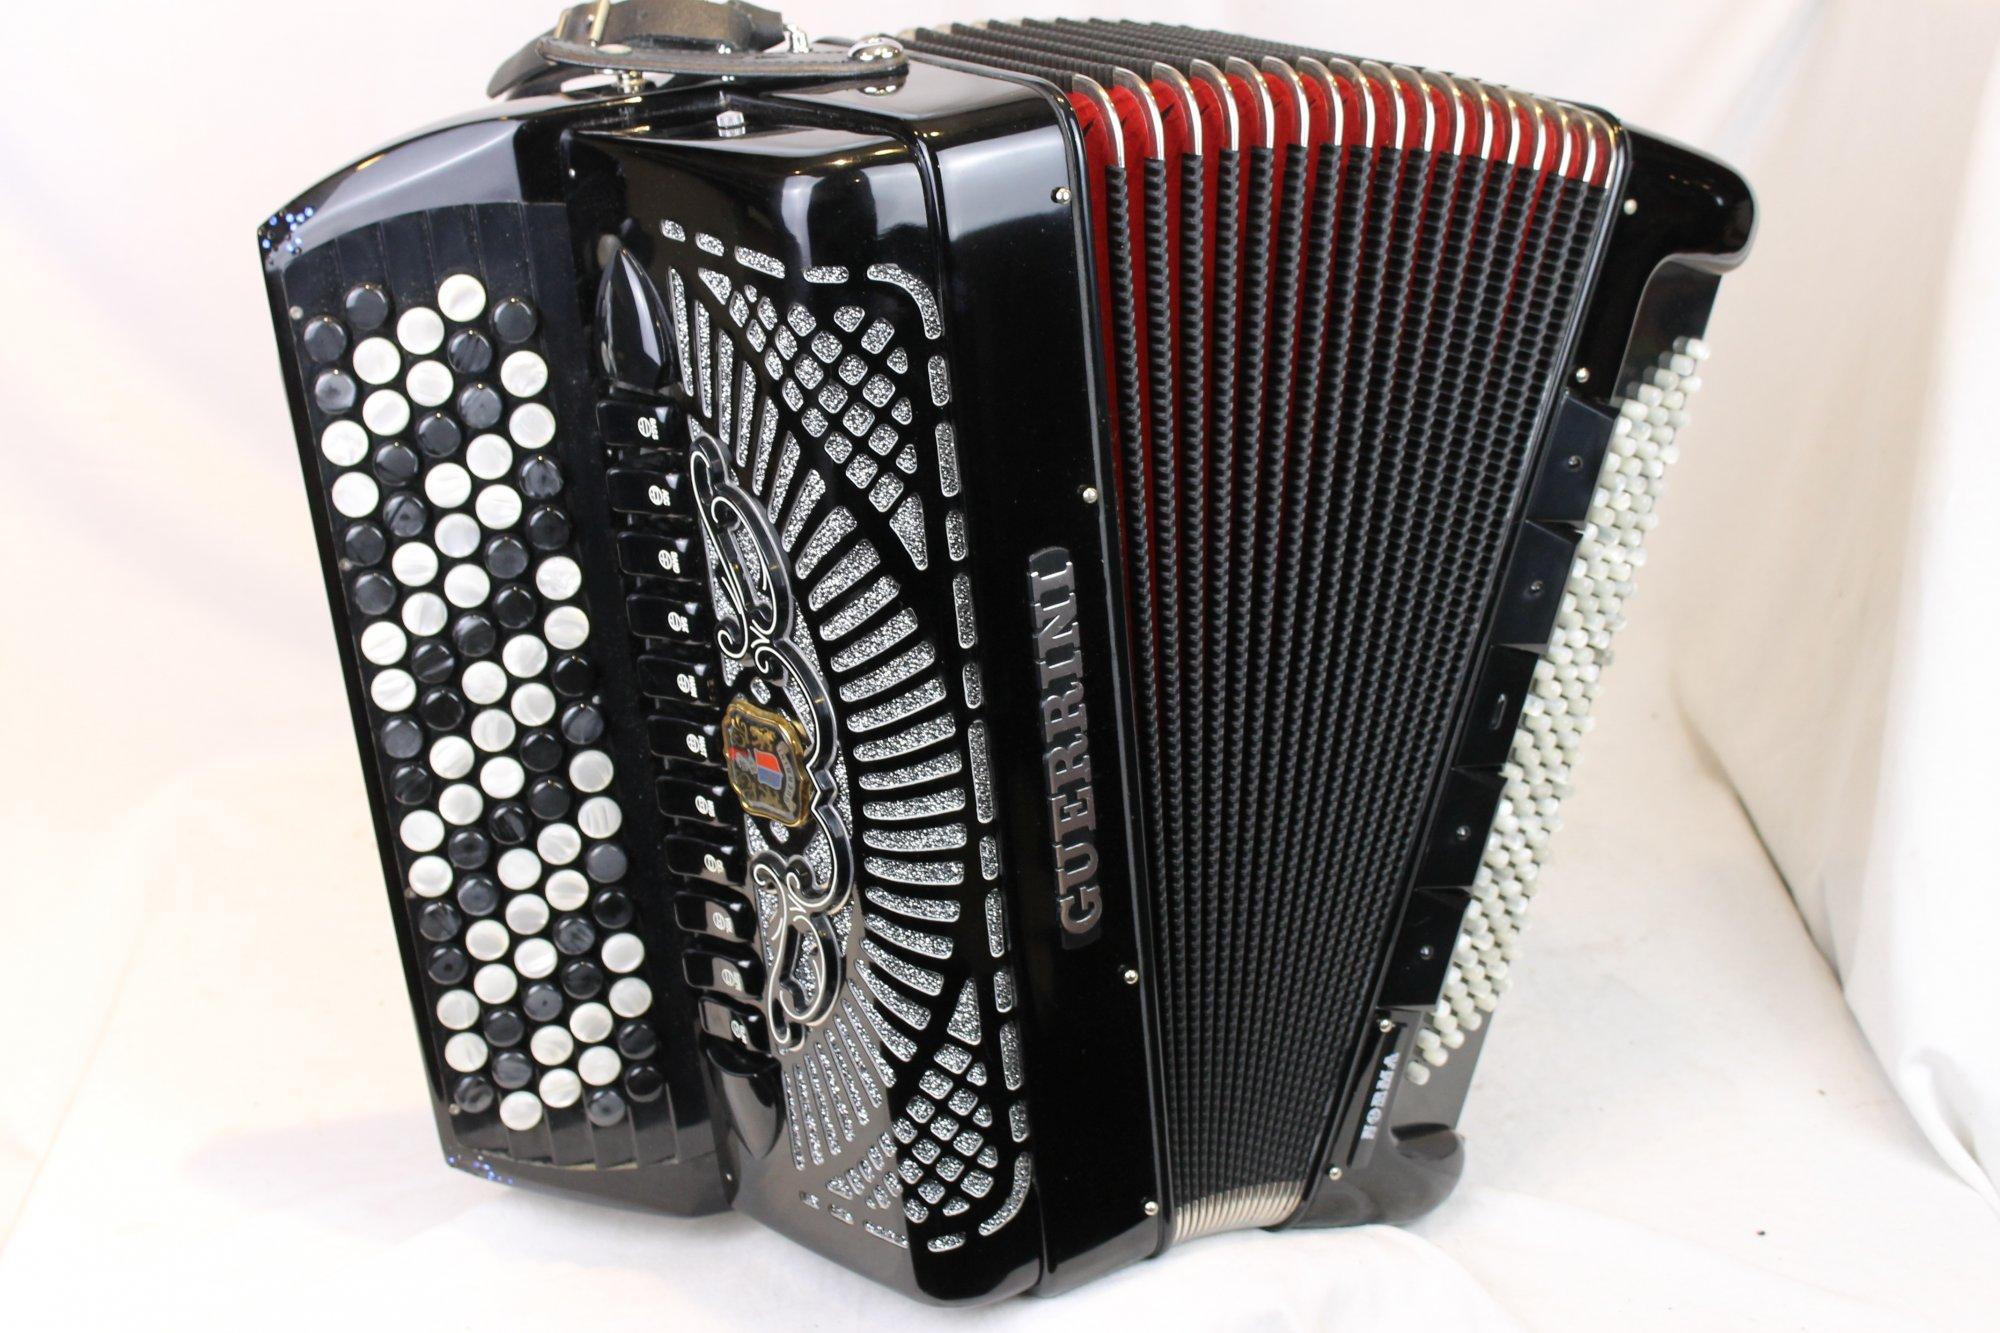 3488 - Black Guerrini Norma Chromatic Accordion LMMM 92 120